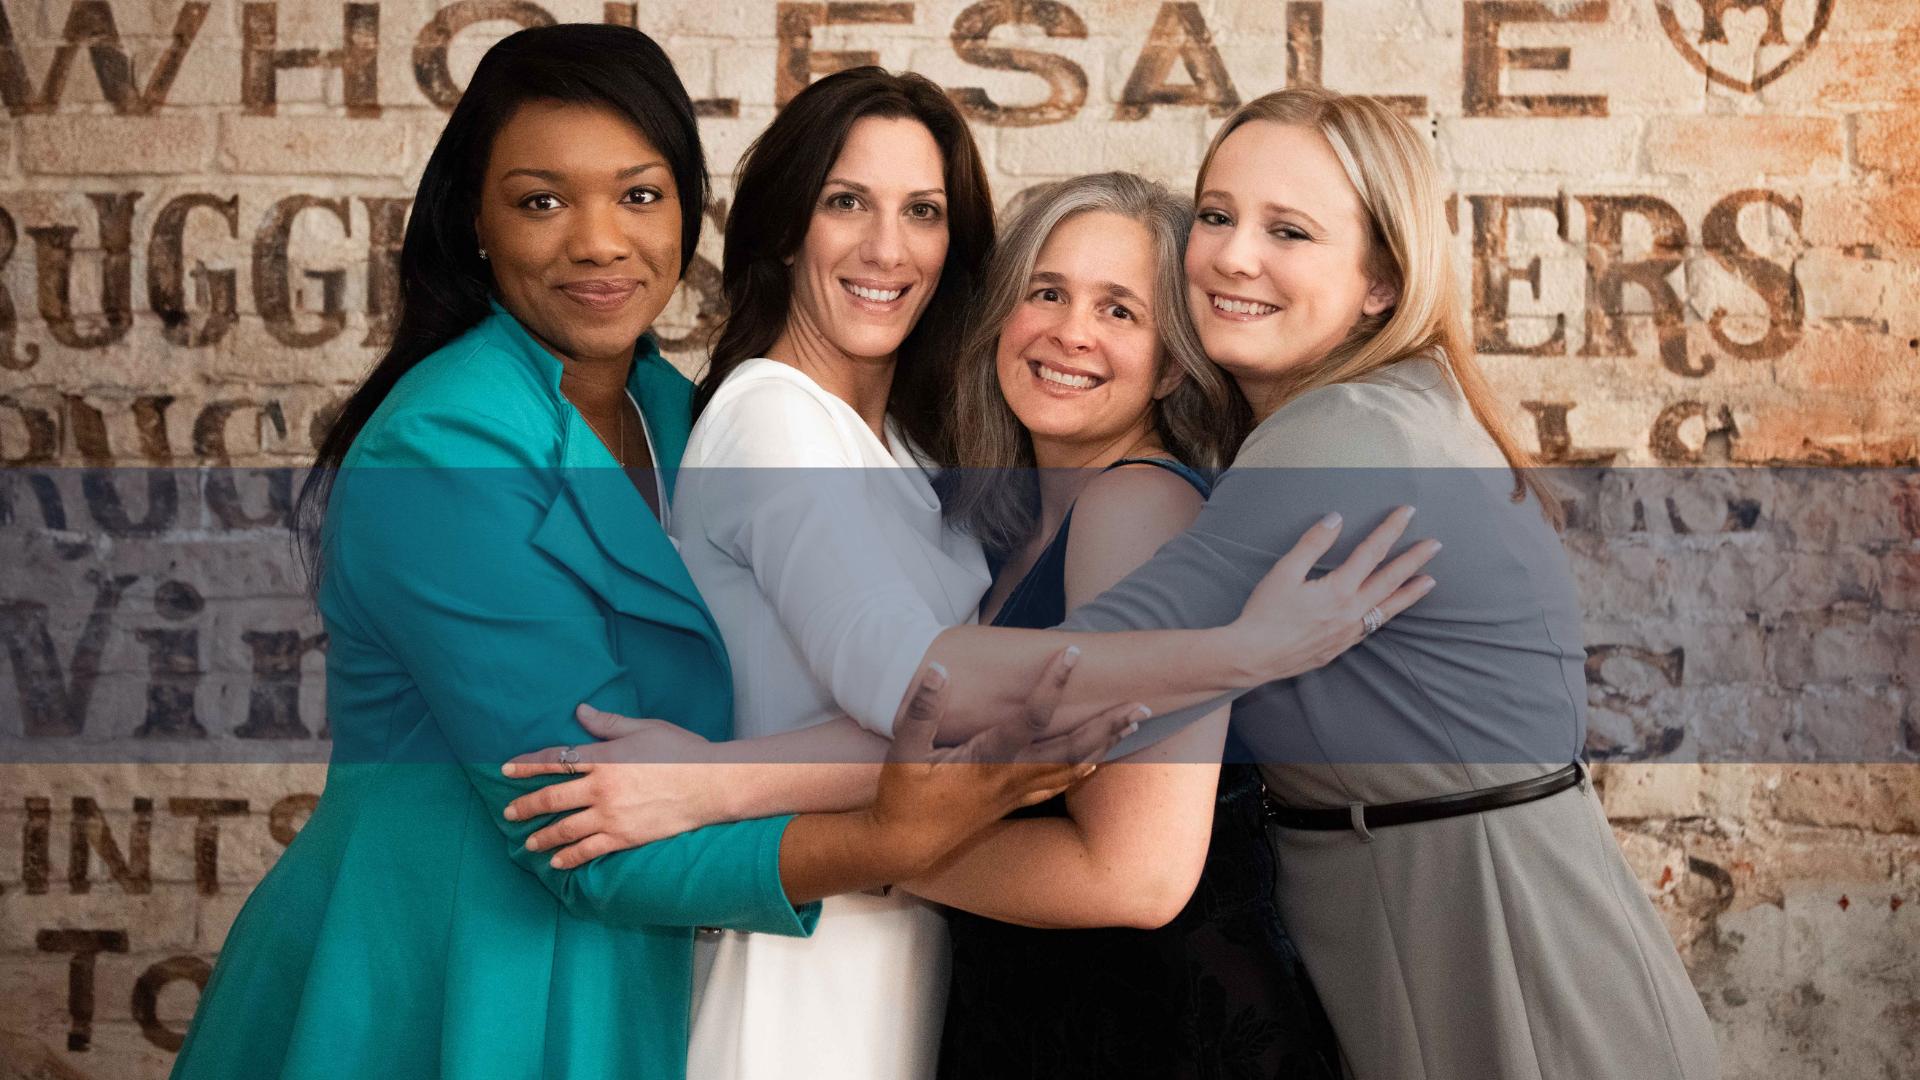 Chloe Capital | Invest In Women